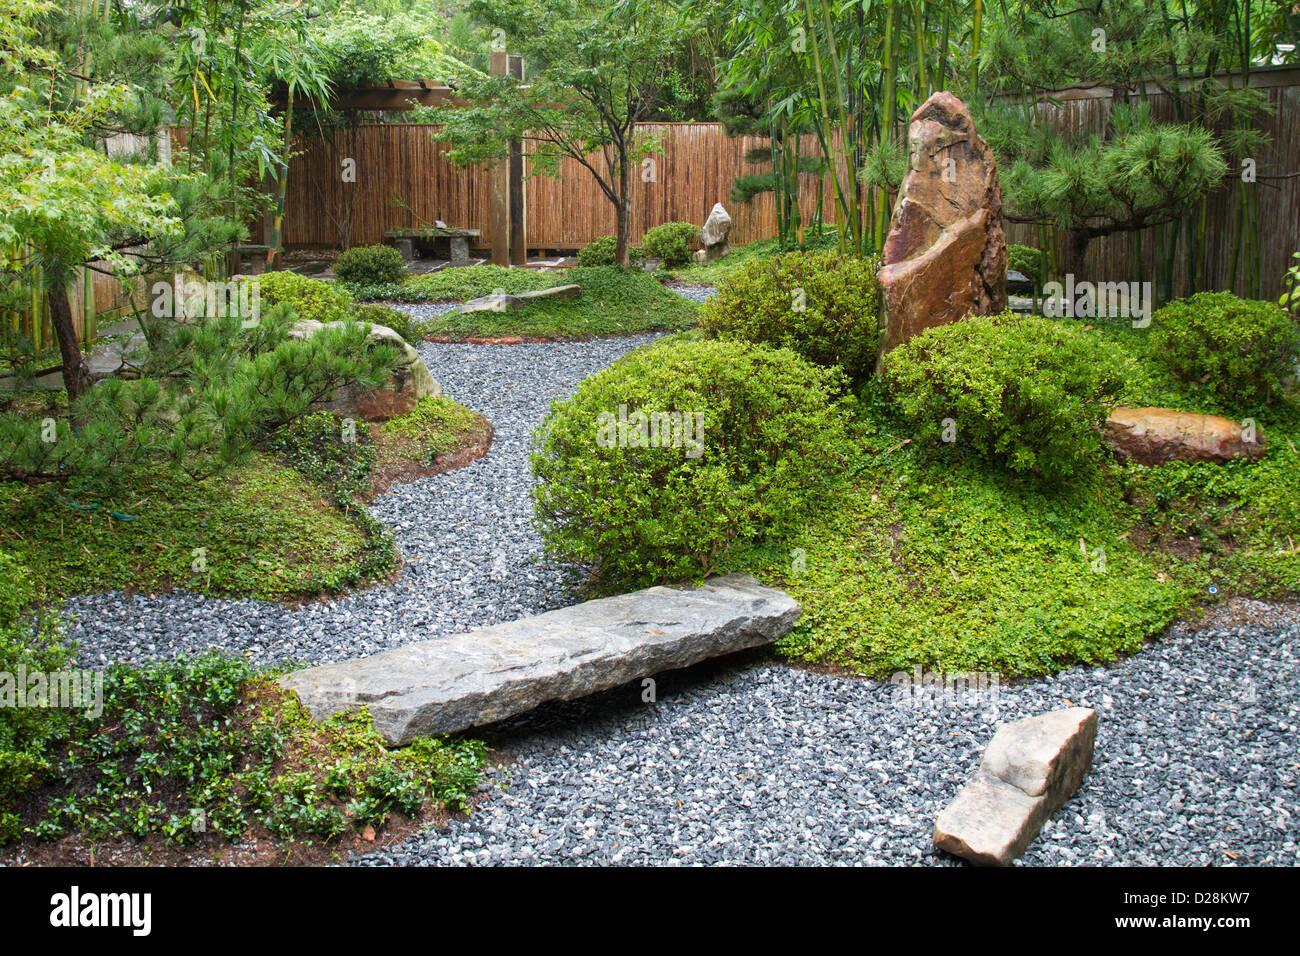 LA, New Orleans, New Orleans Botanical Garden, The Yakumo Nihon Teien  Japanese Garden